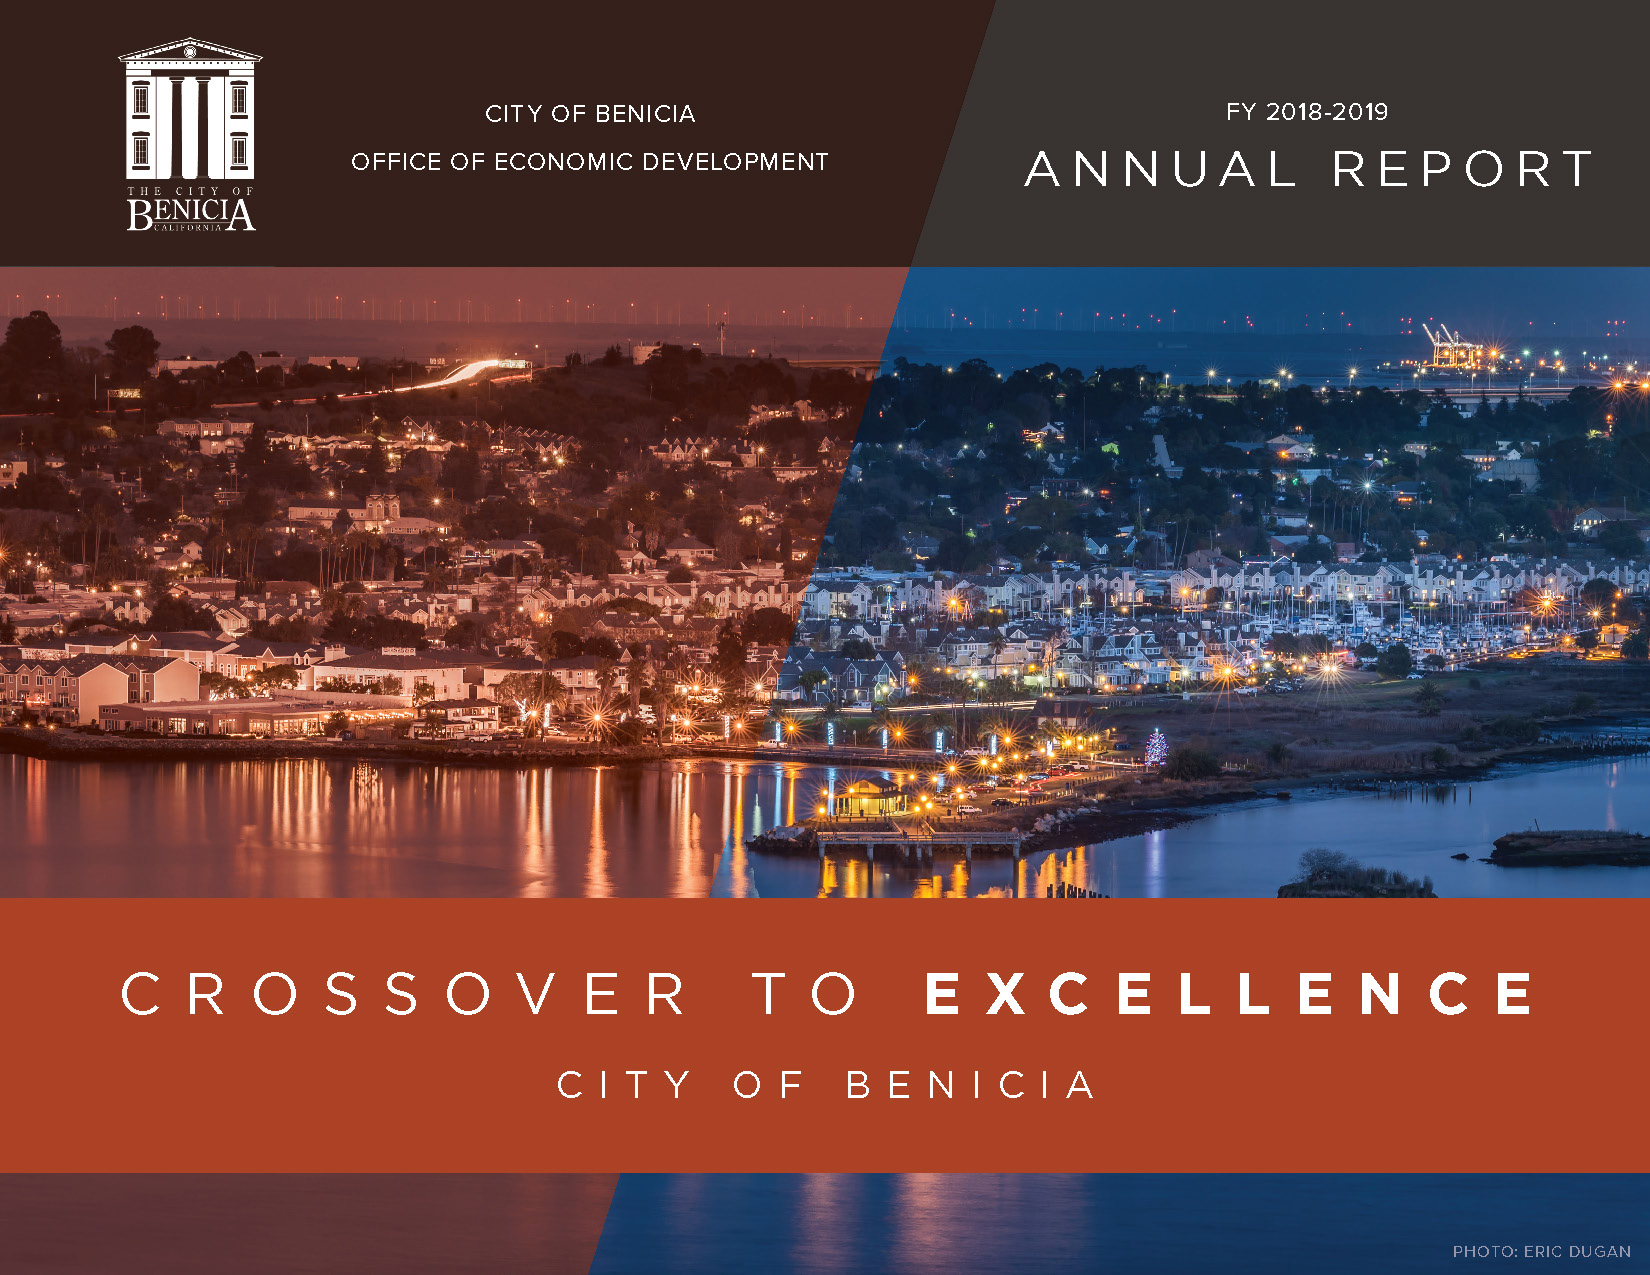 Get the Benicia Annual Report  here .